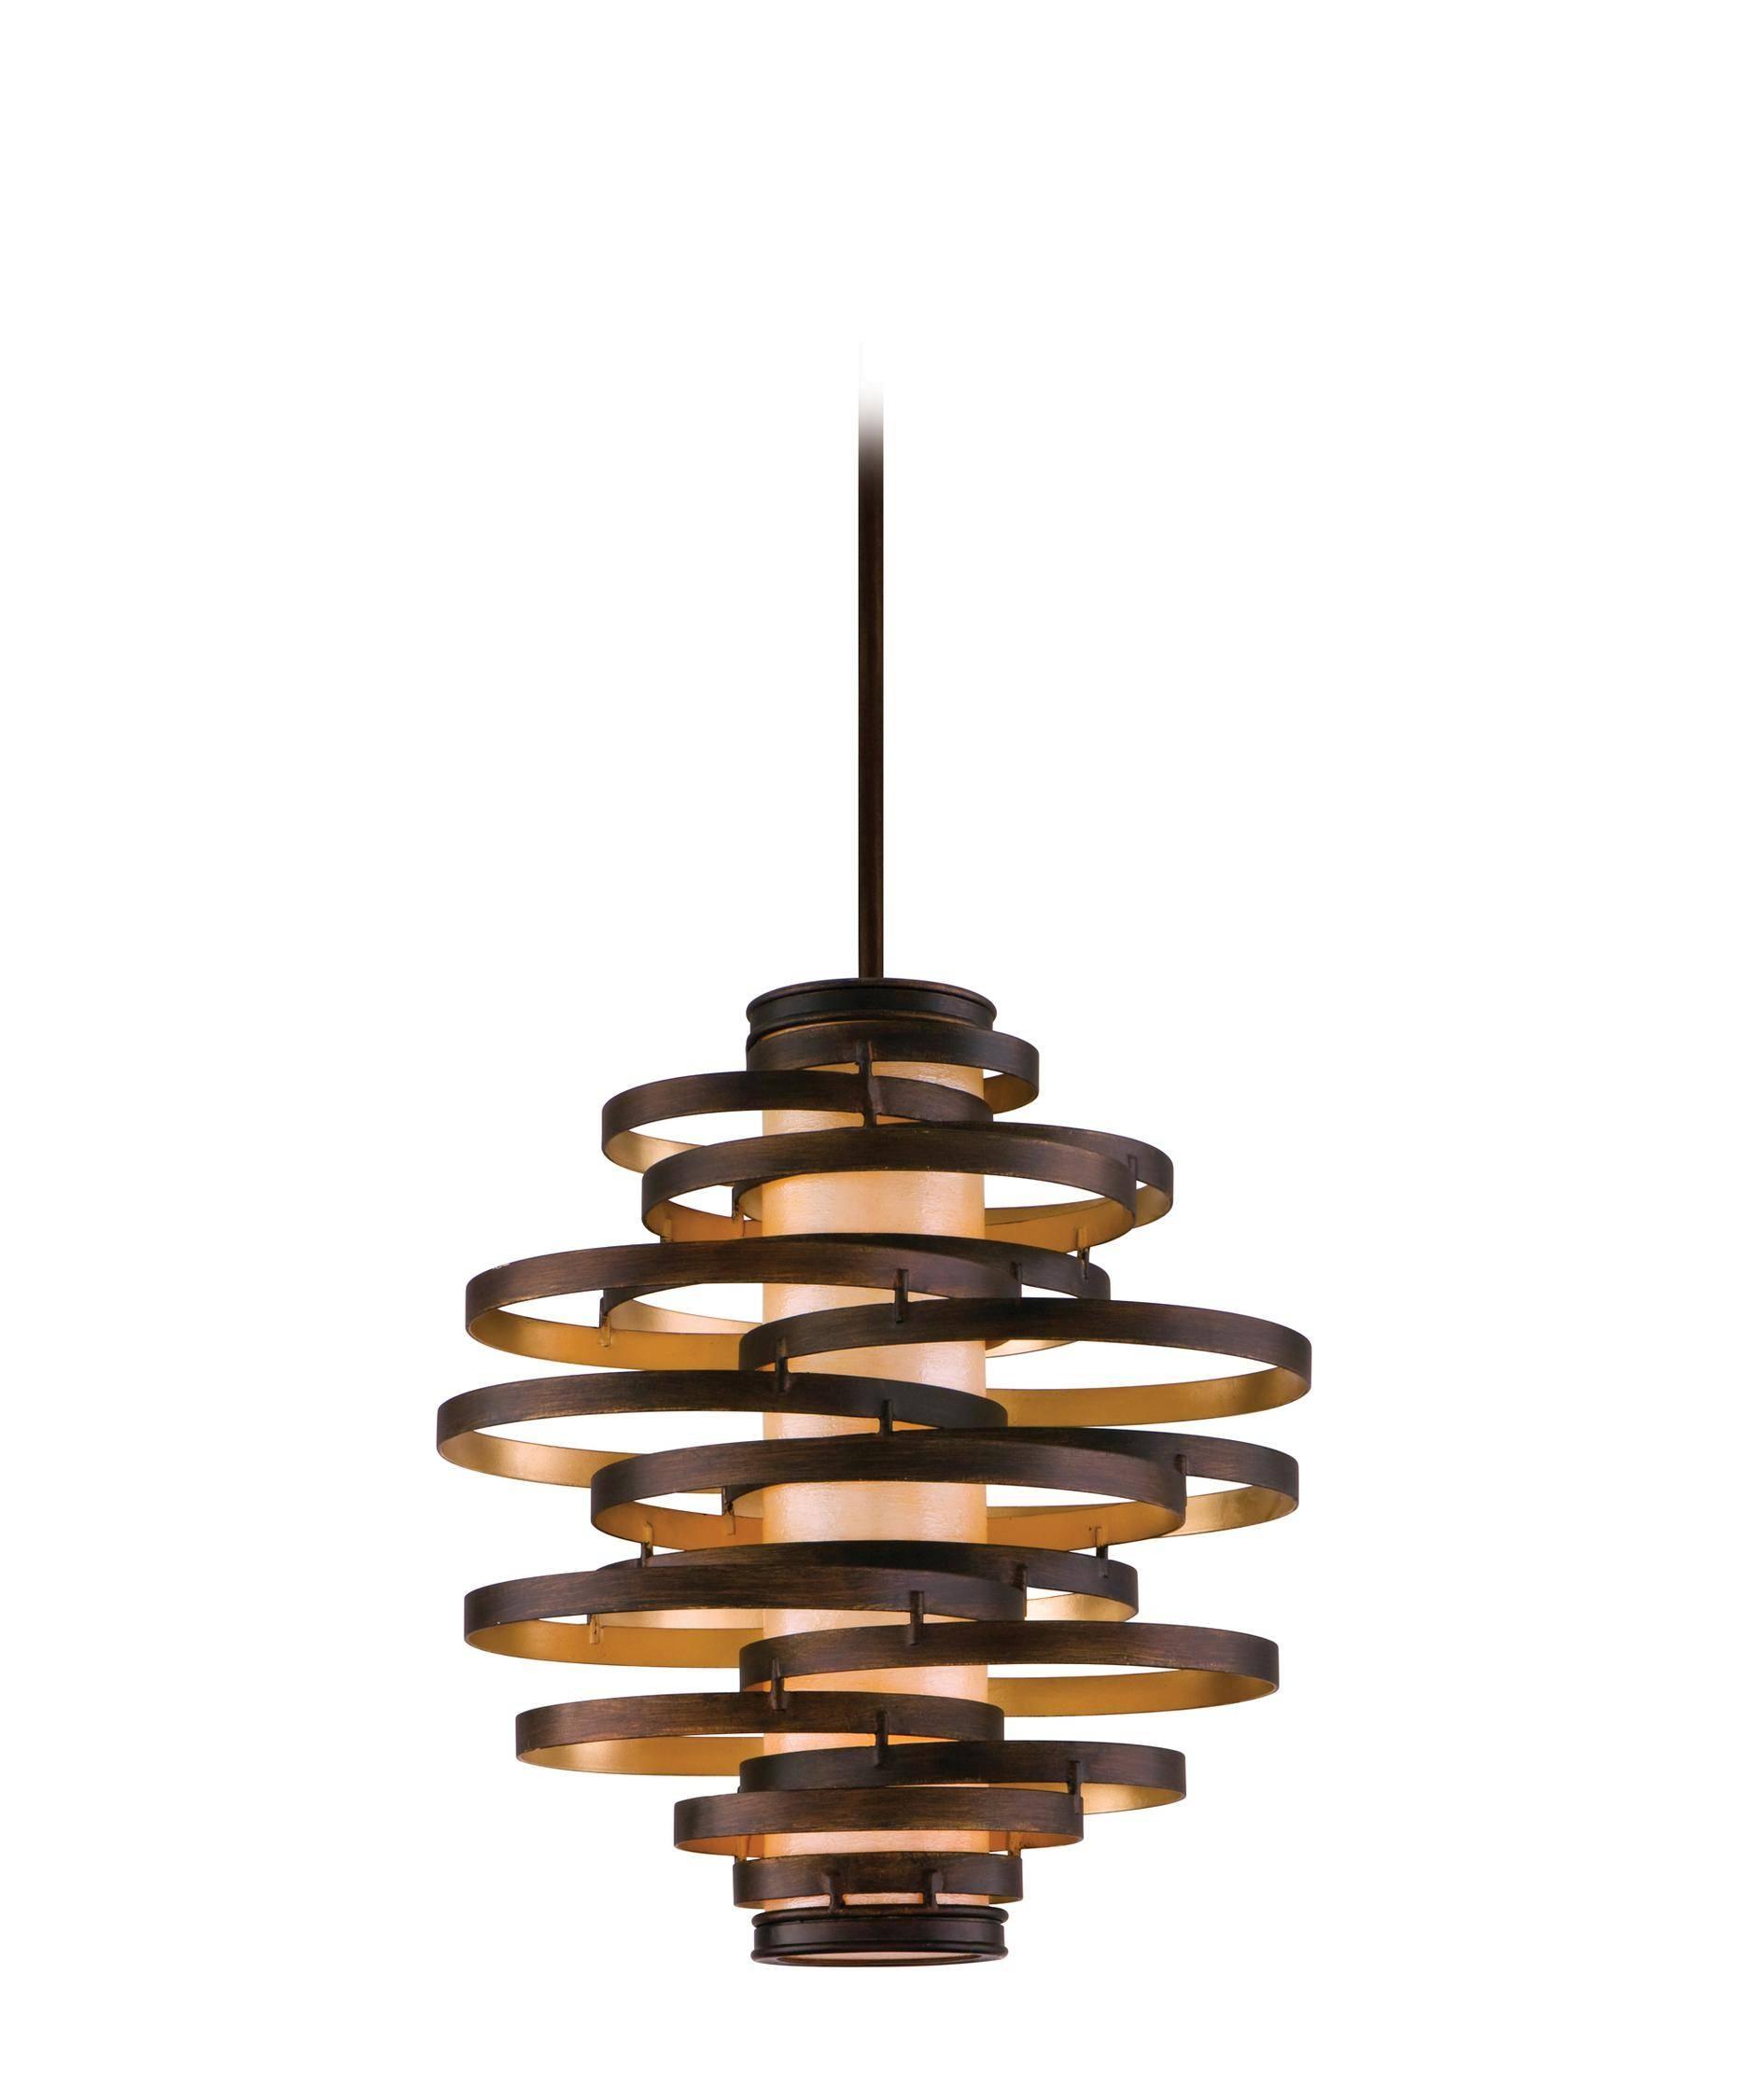 Buy Corbett Lighting | Avoli regarding Corbett Vertigo Medium Pendant Lights (Image 2 of 15)